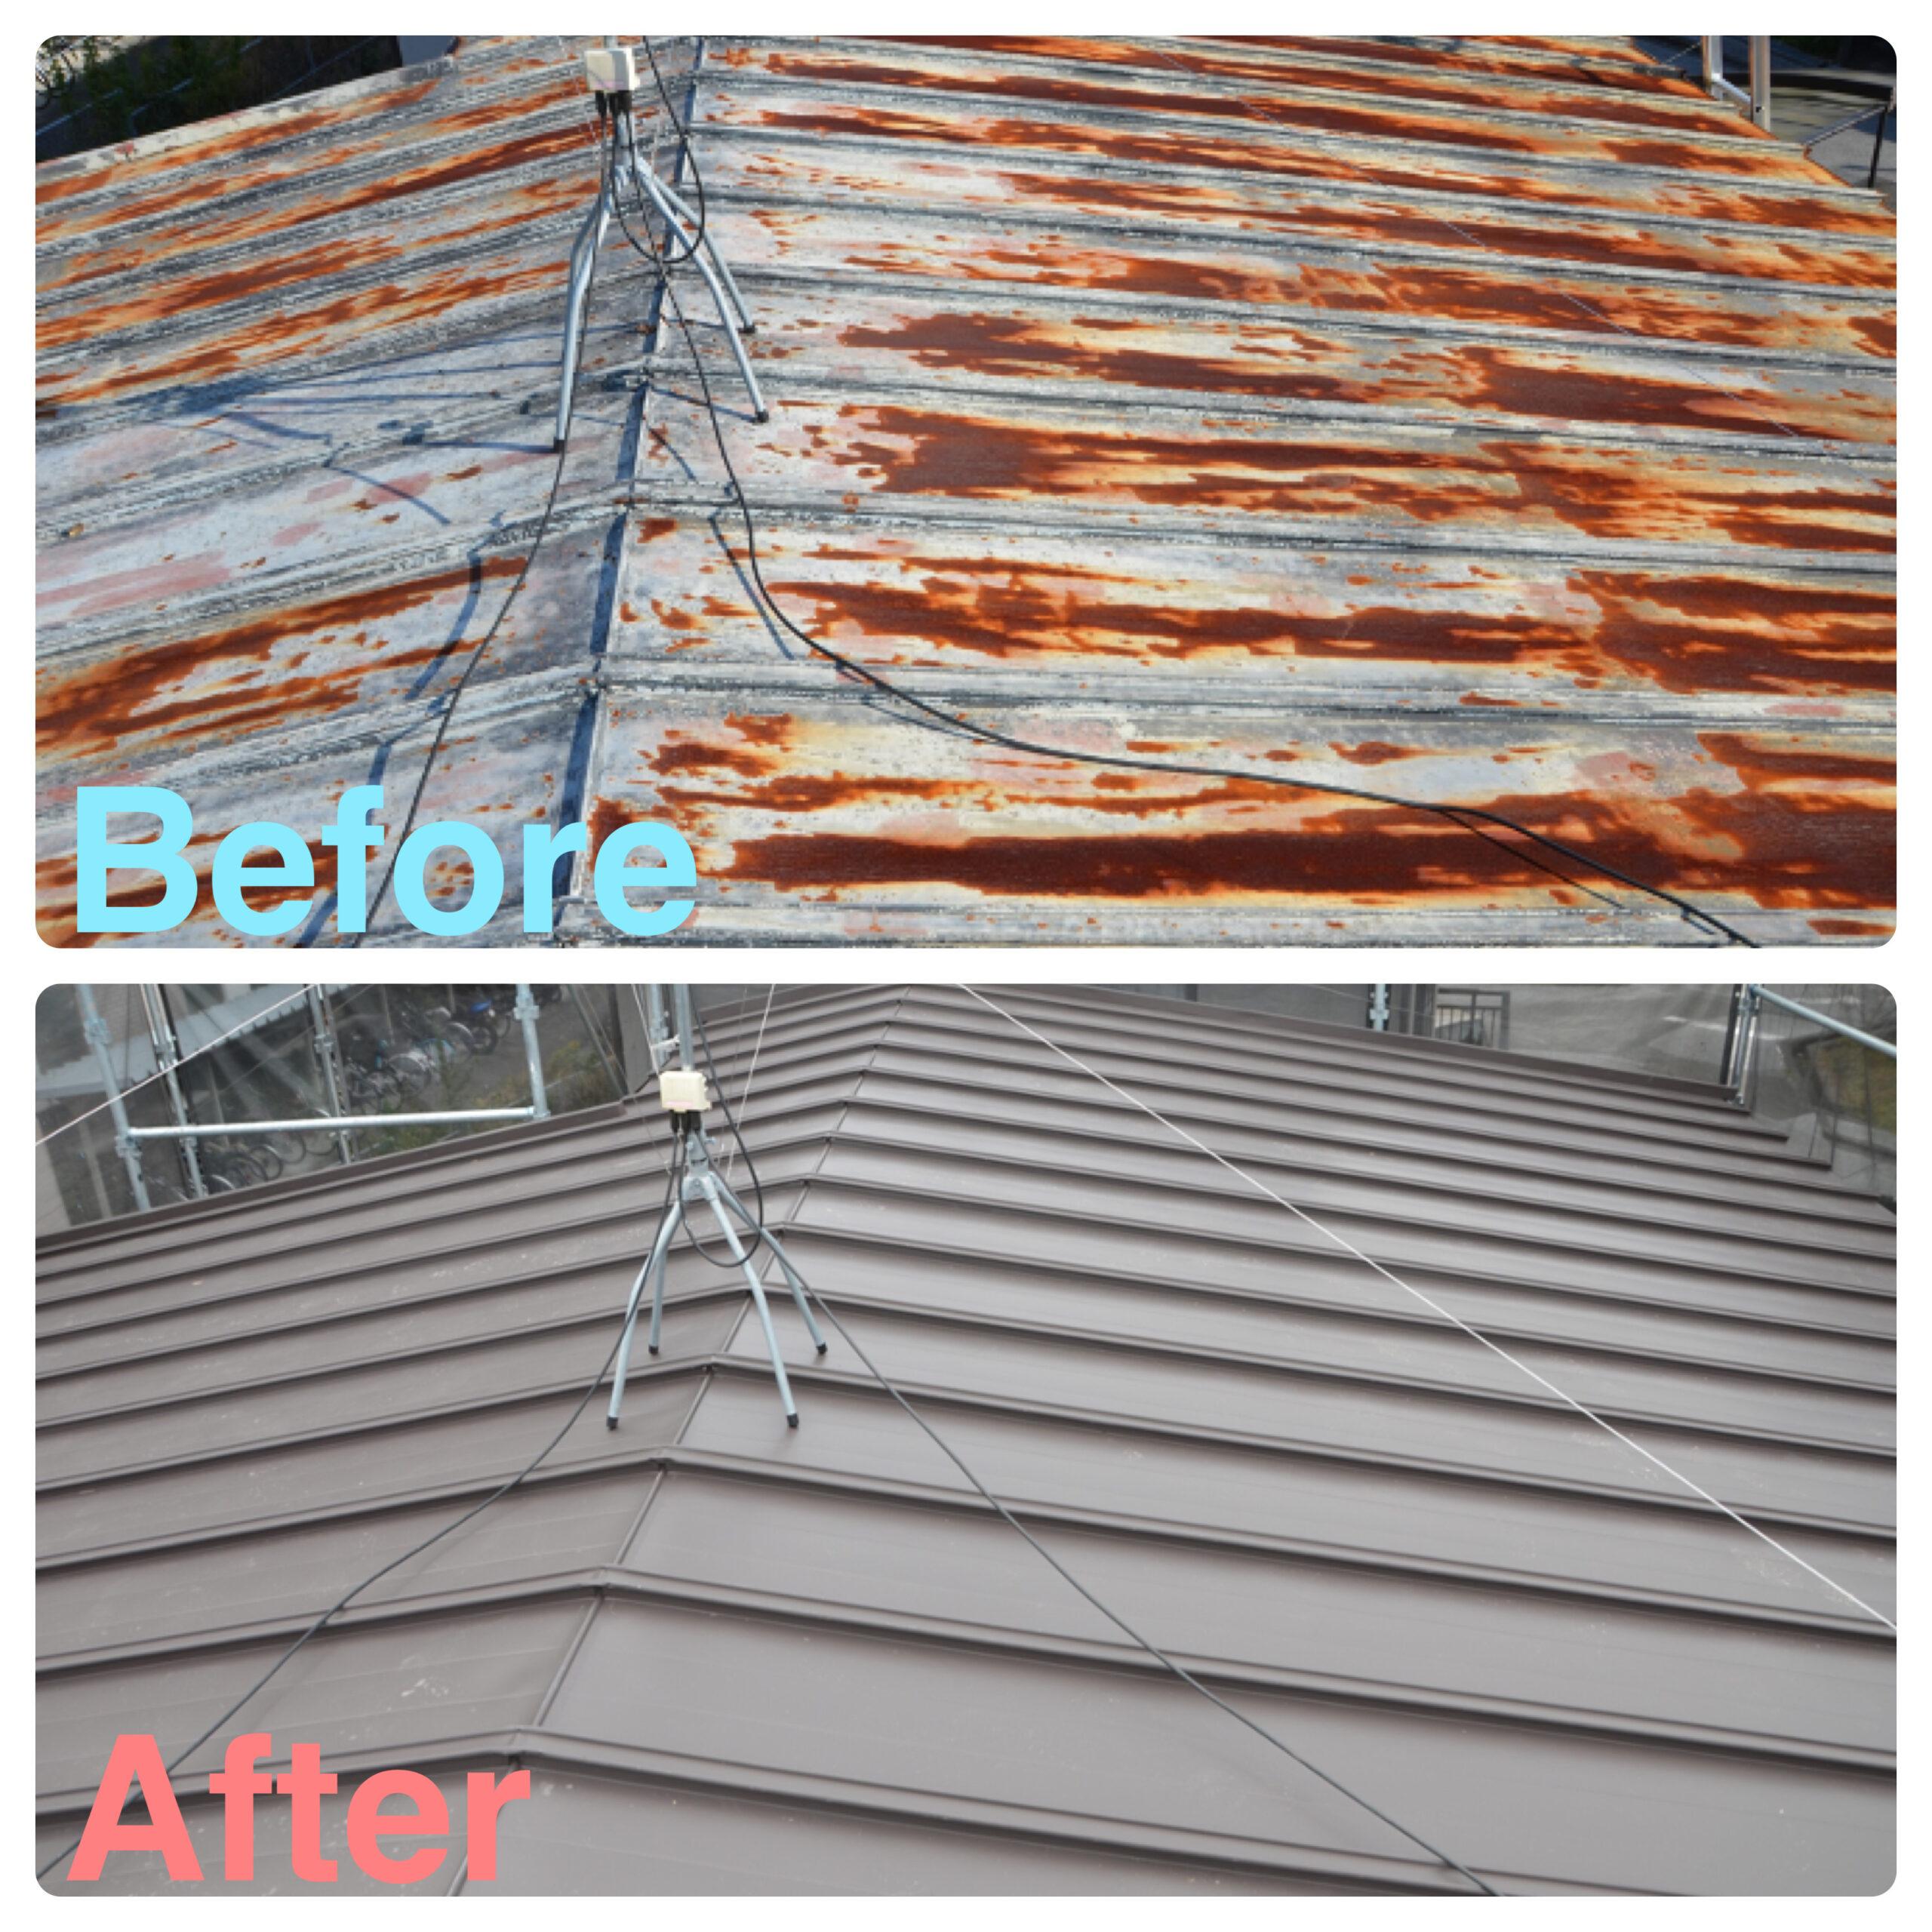 仙台市 屋根葺き替え&外壁塗装